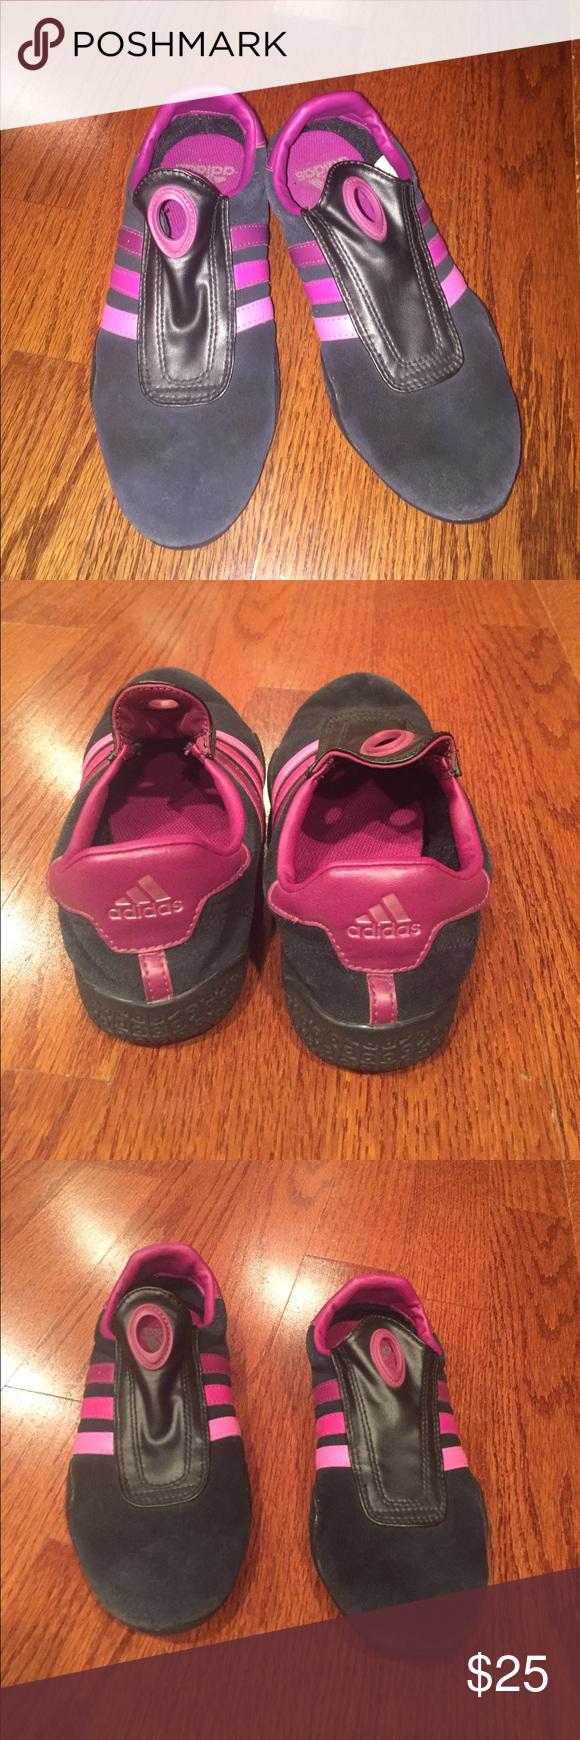 Adidas raggiunse le adidas diapositive, materiale di velluto e adidas